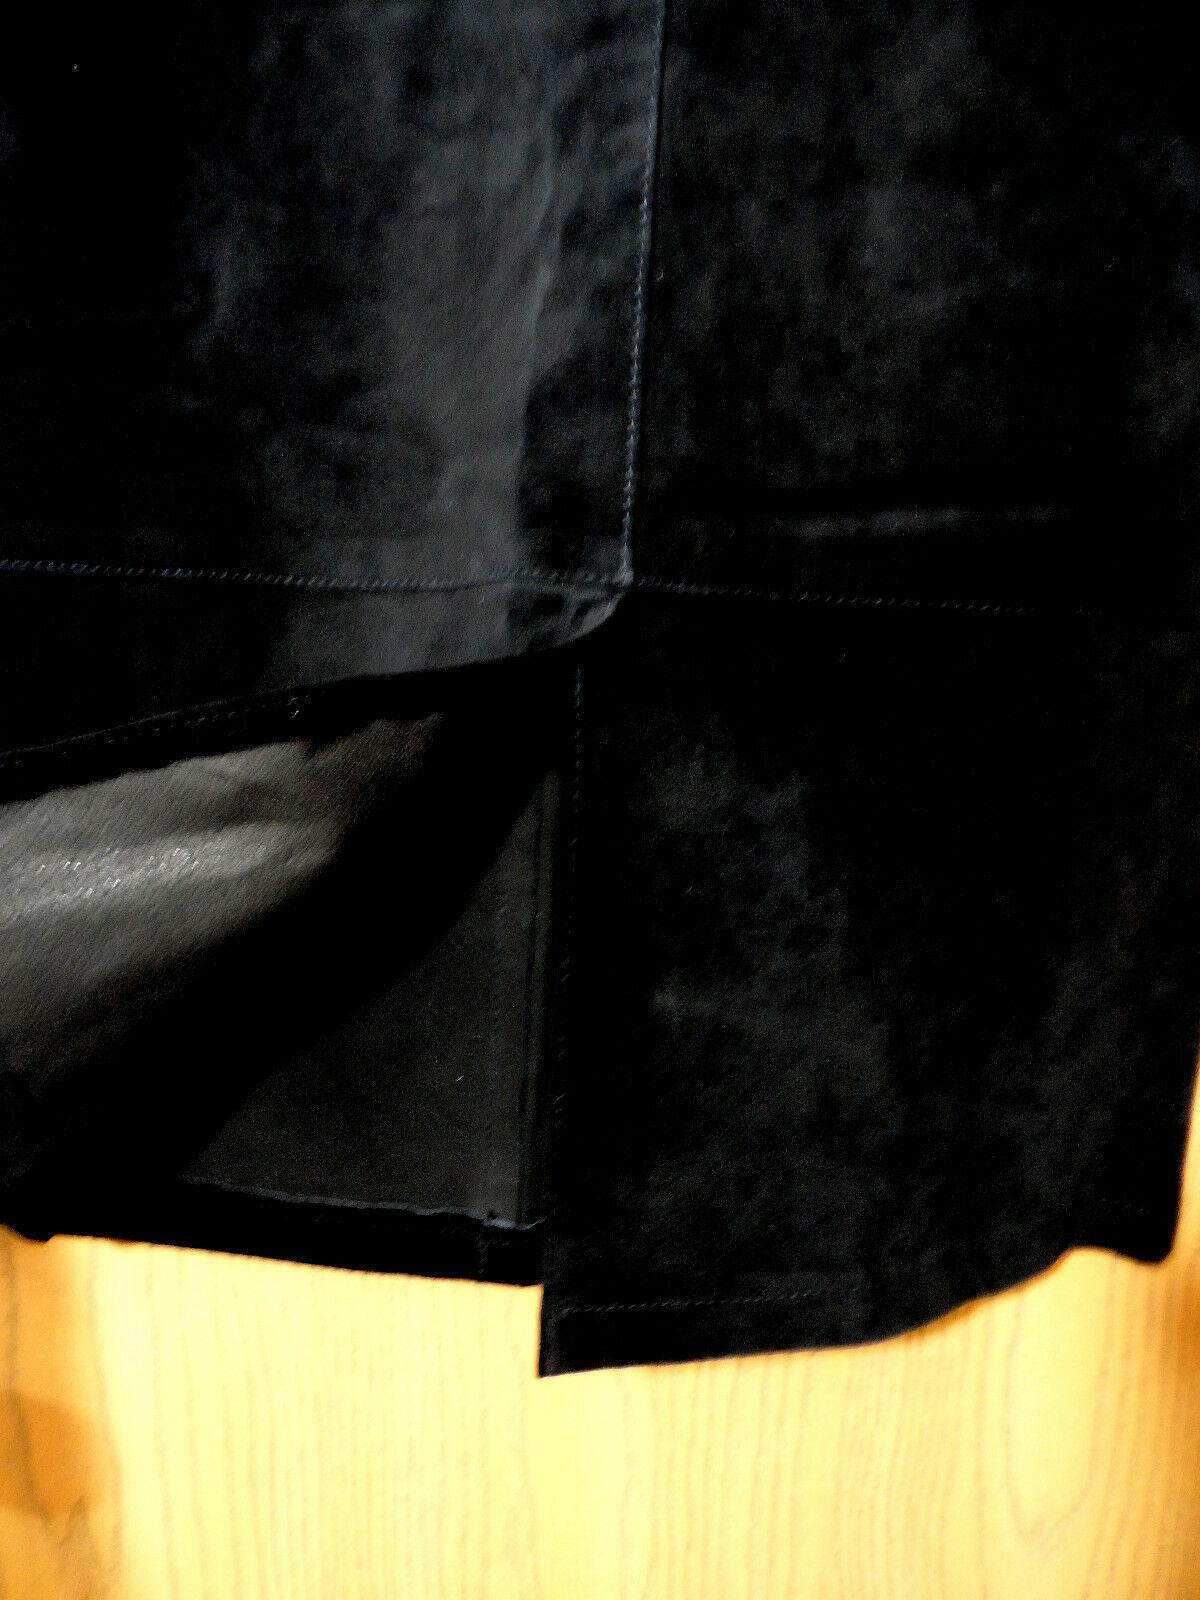 SKOTTS SUEDE Washable Leather Skirt sz 4 Black Midi Straight pencil fit Canadian image 3